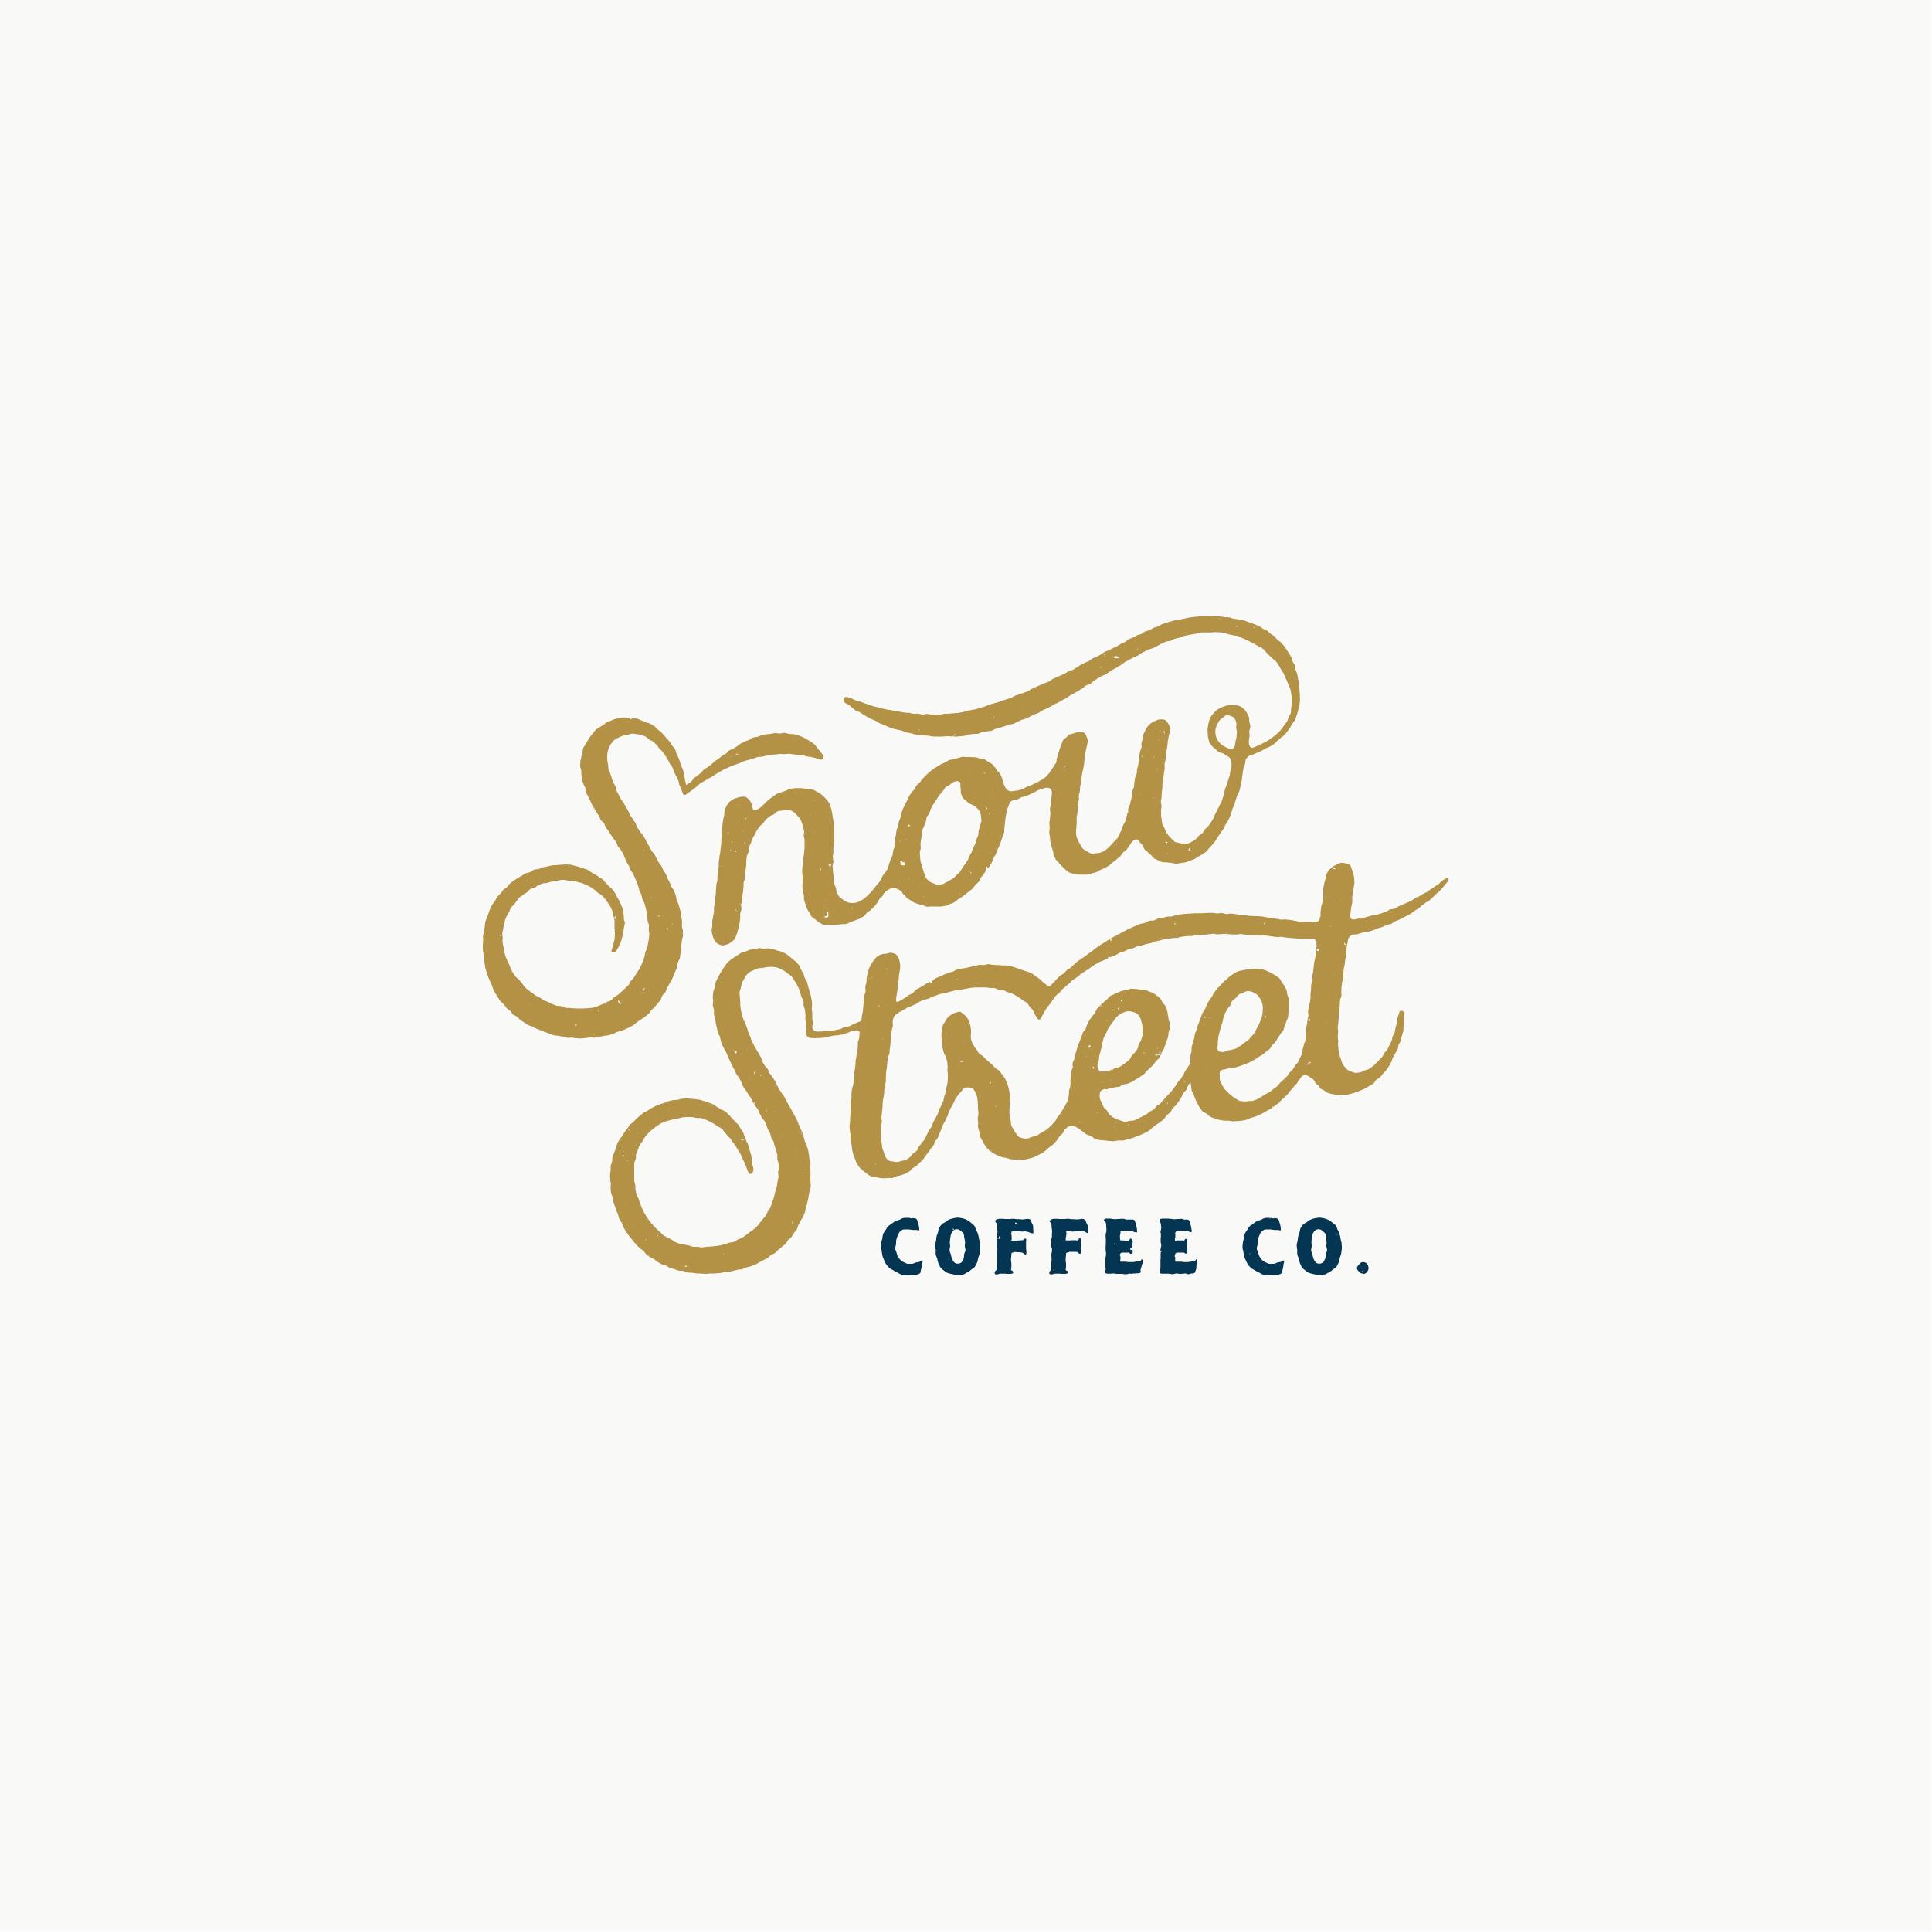 TBS_LogosMarks_SnowStreet_1